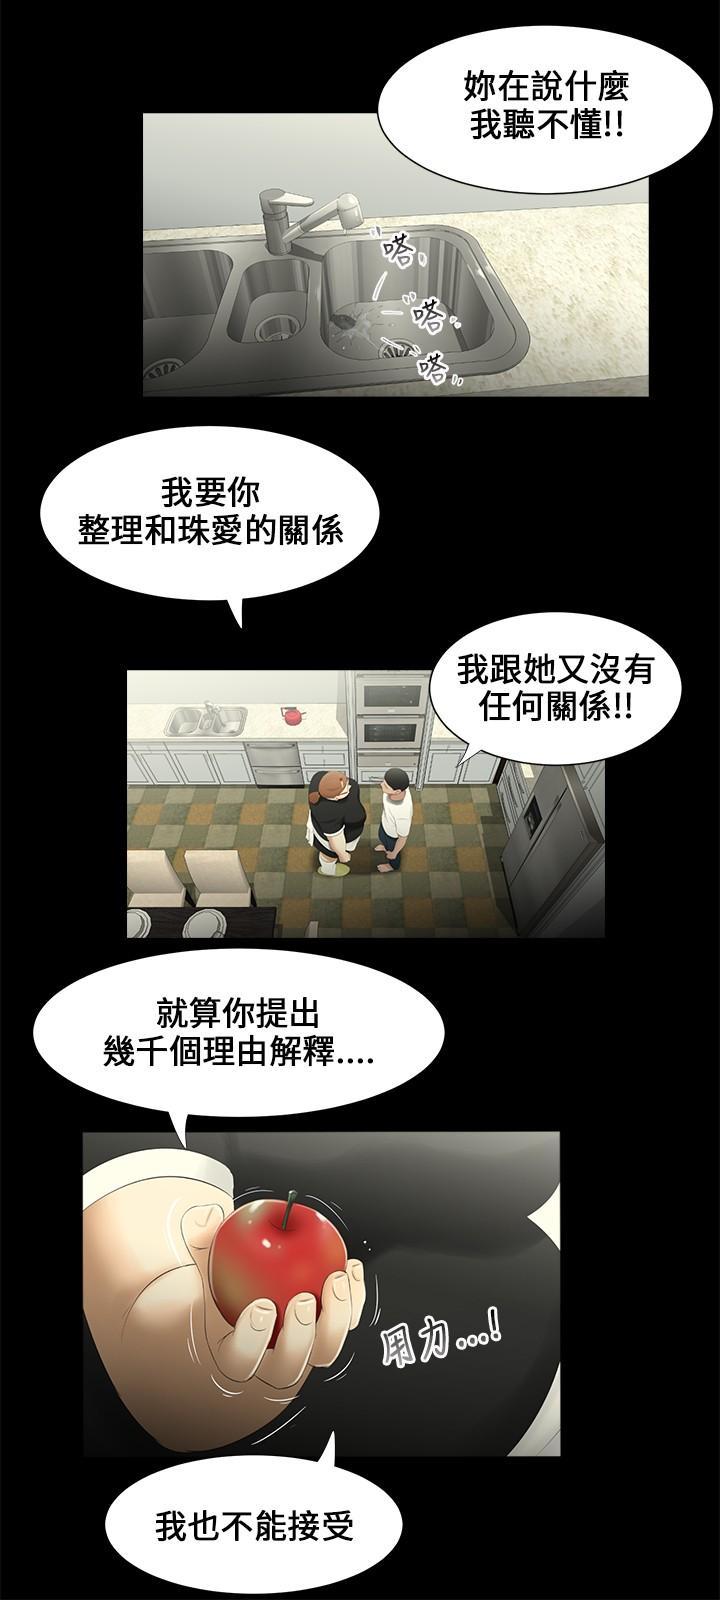 Three sisters 三姐妹Ch.13~19 (Chinese)中文 54